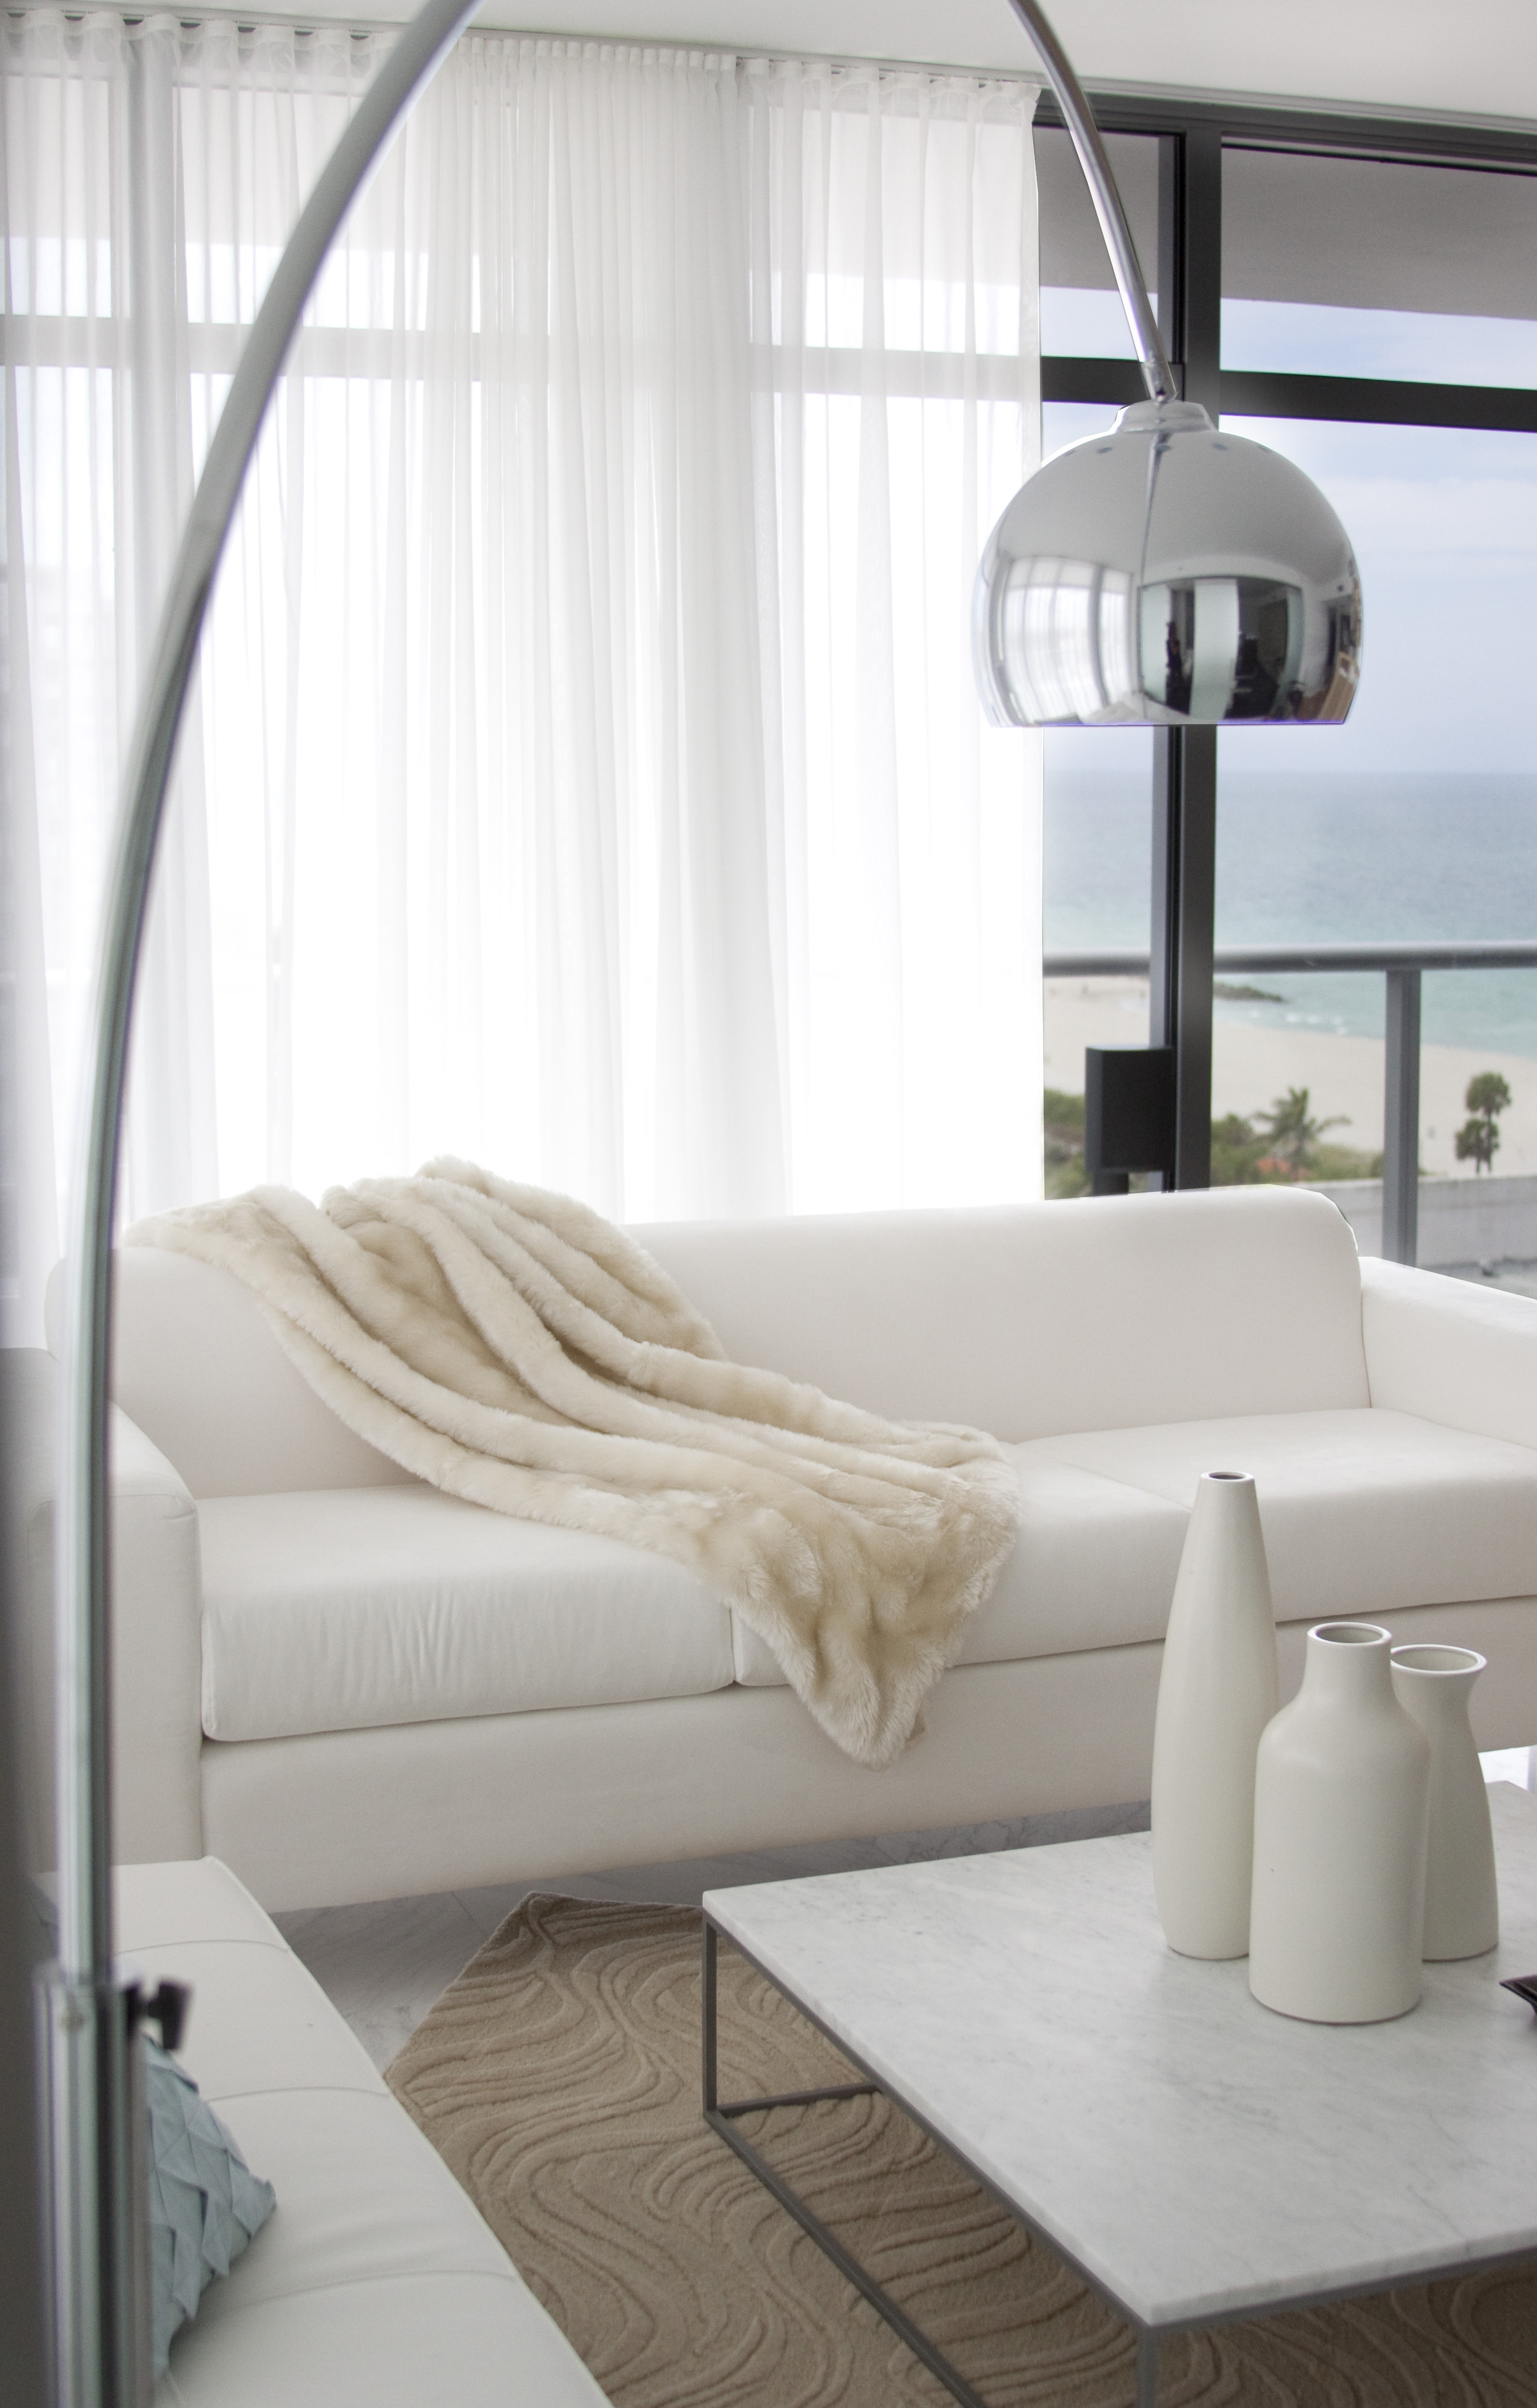 Recent Elegant Living Room Table Lamps Inside Stand Lamps For Living Room Elegant Room Best Modern Floor Lamps (View 12 of 15)